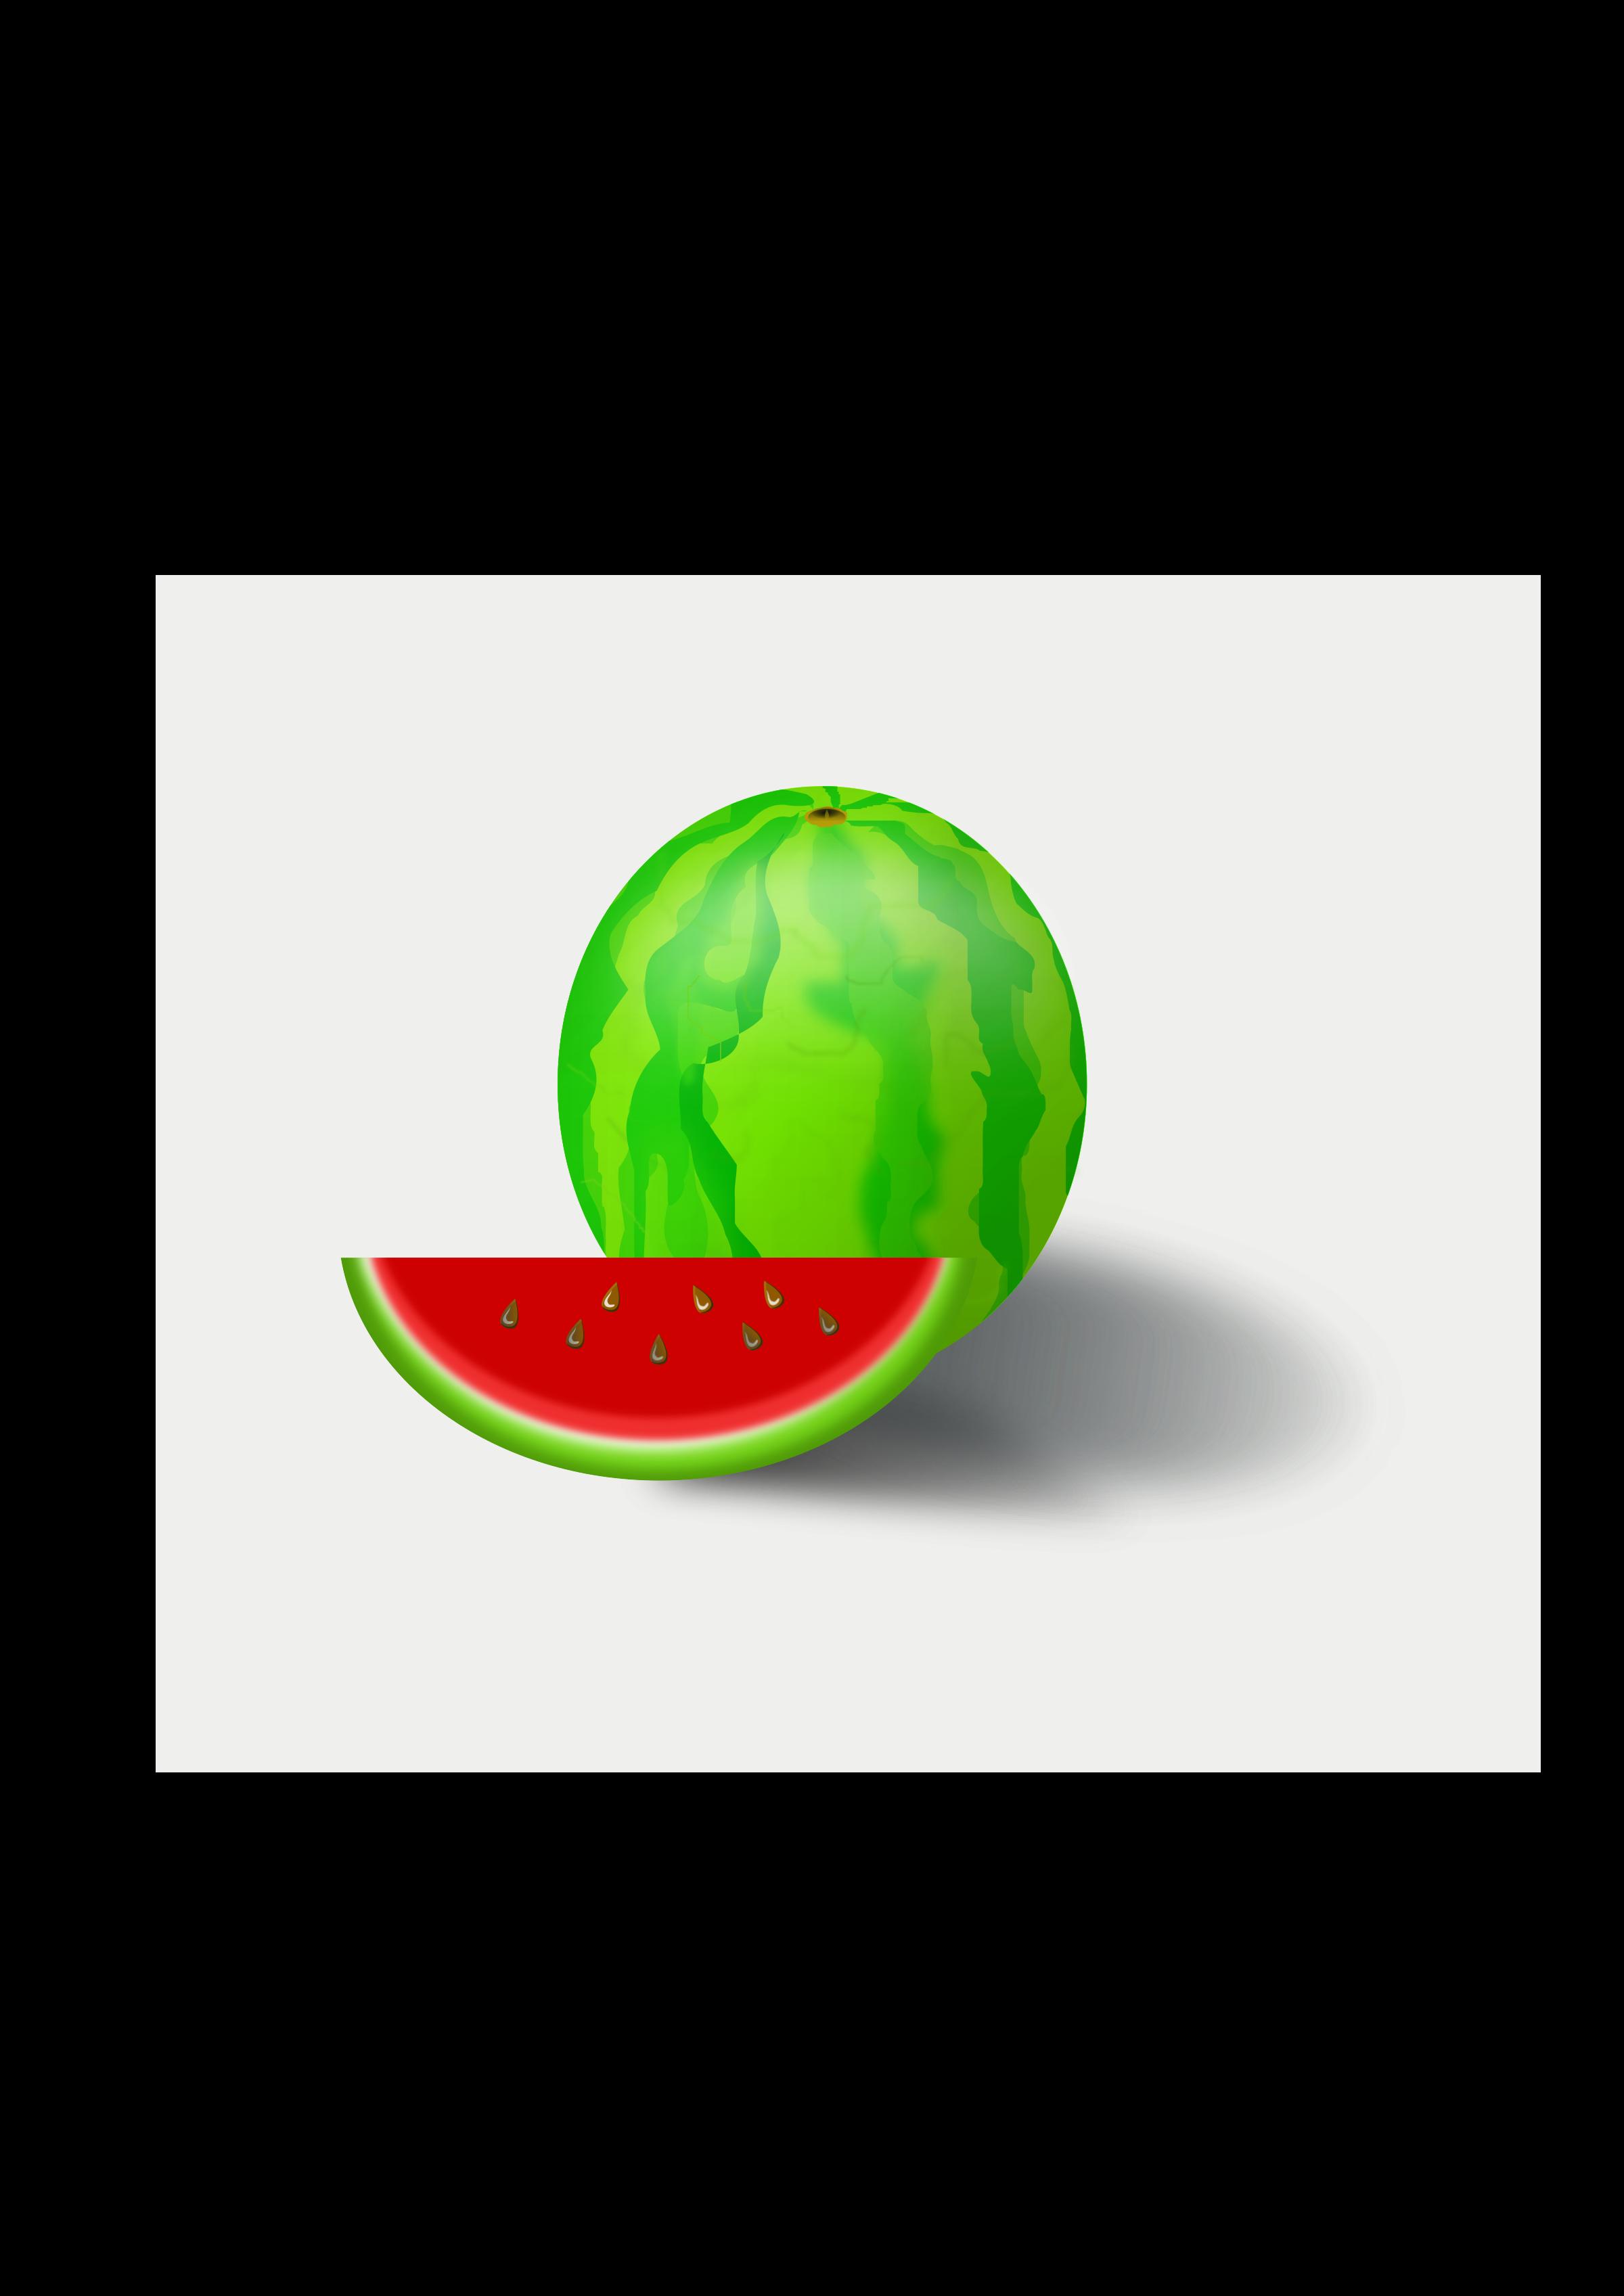 Fruit big image png. Watermelon clipart vector